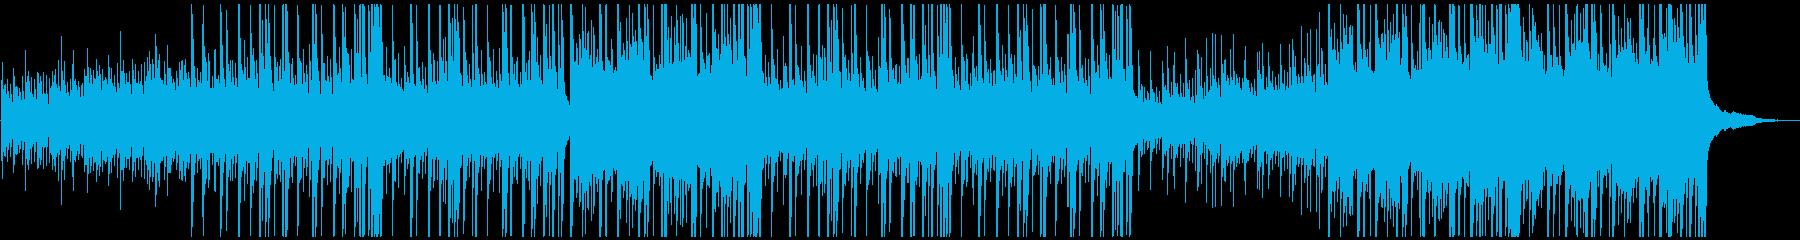 Hiphop/Pianoの再生済みの波形